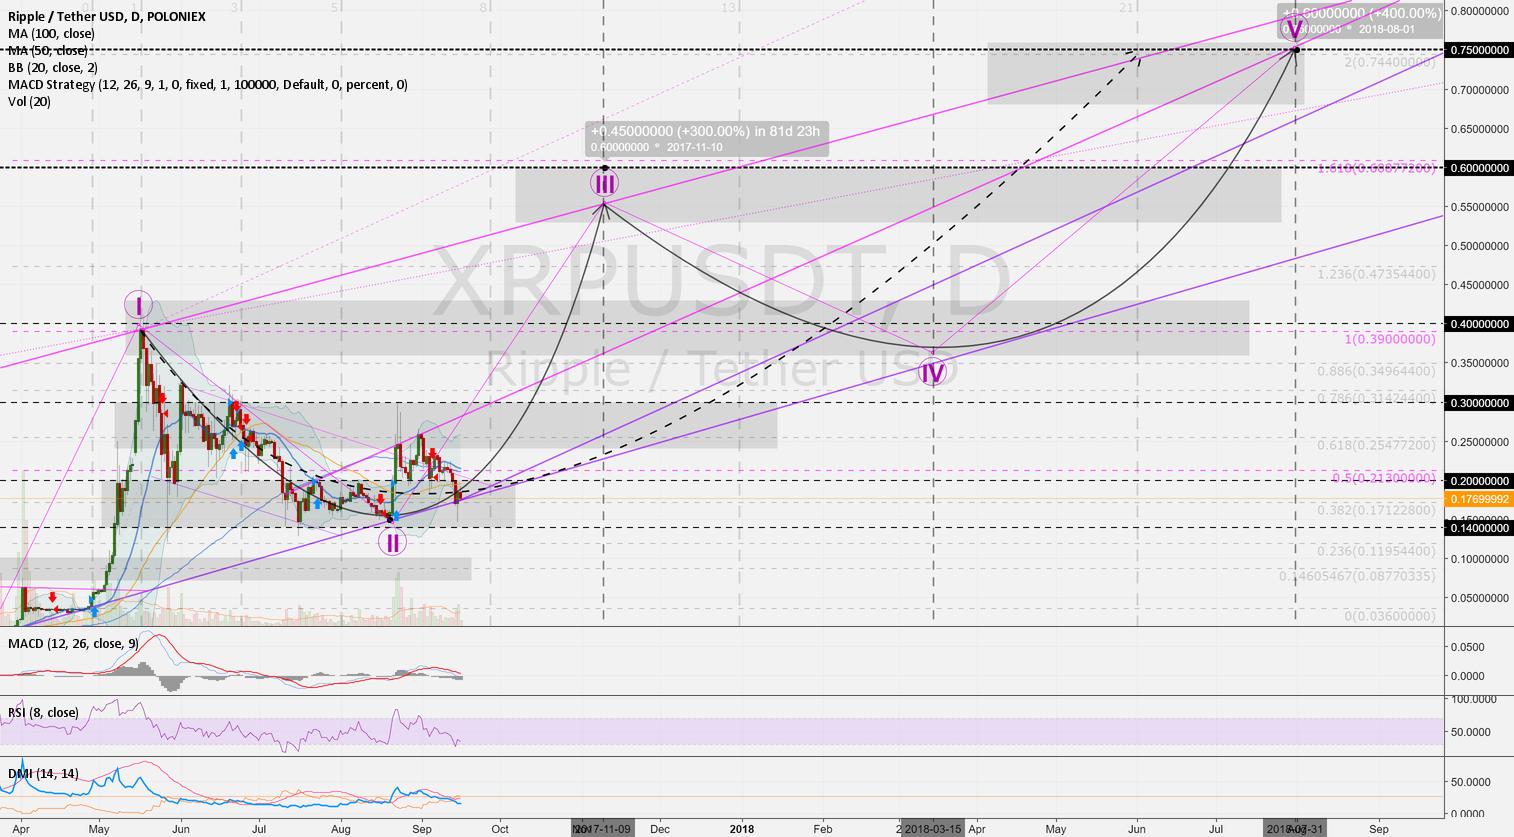 RippleUSD 1D: 9M-Forecast 0.20 > 0.30 > 0.40 > 0.60 > 0.75 USD